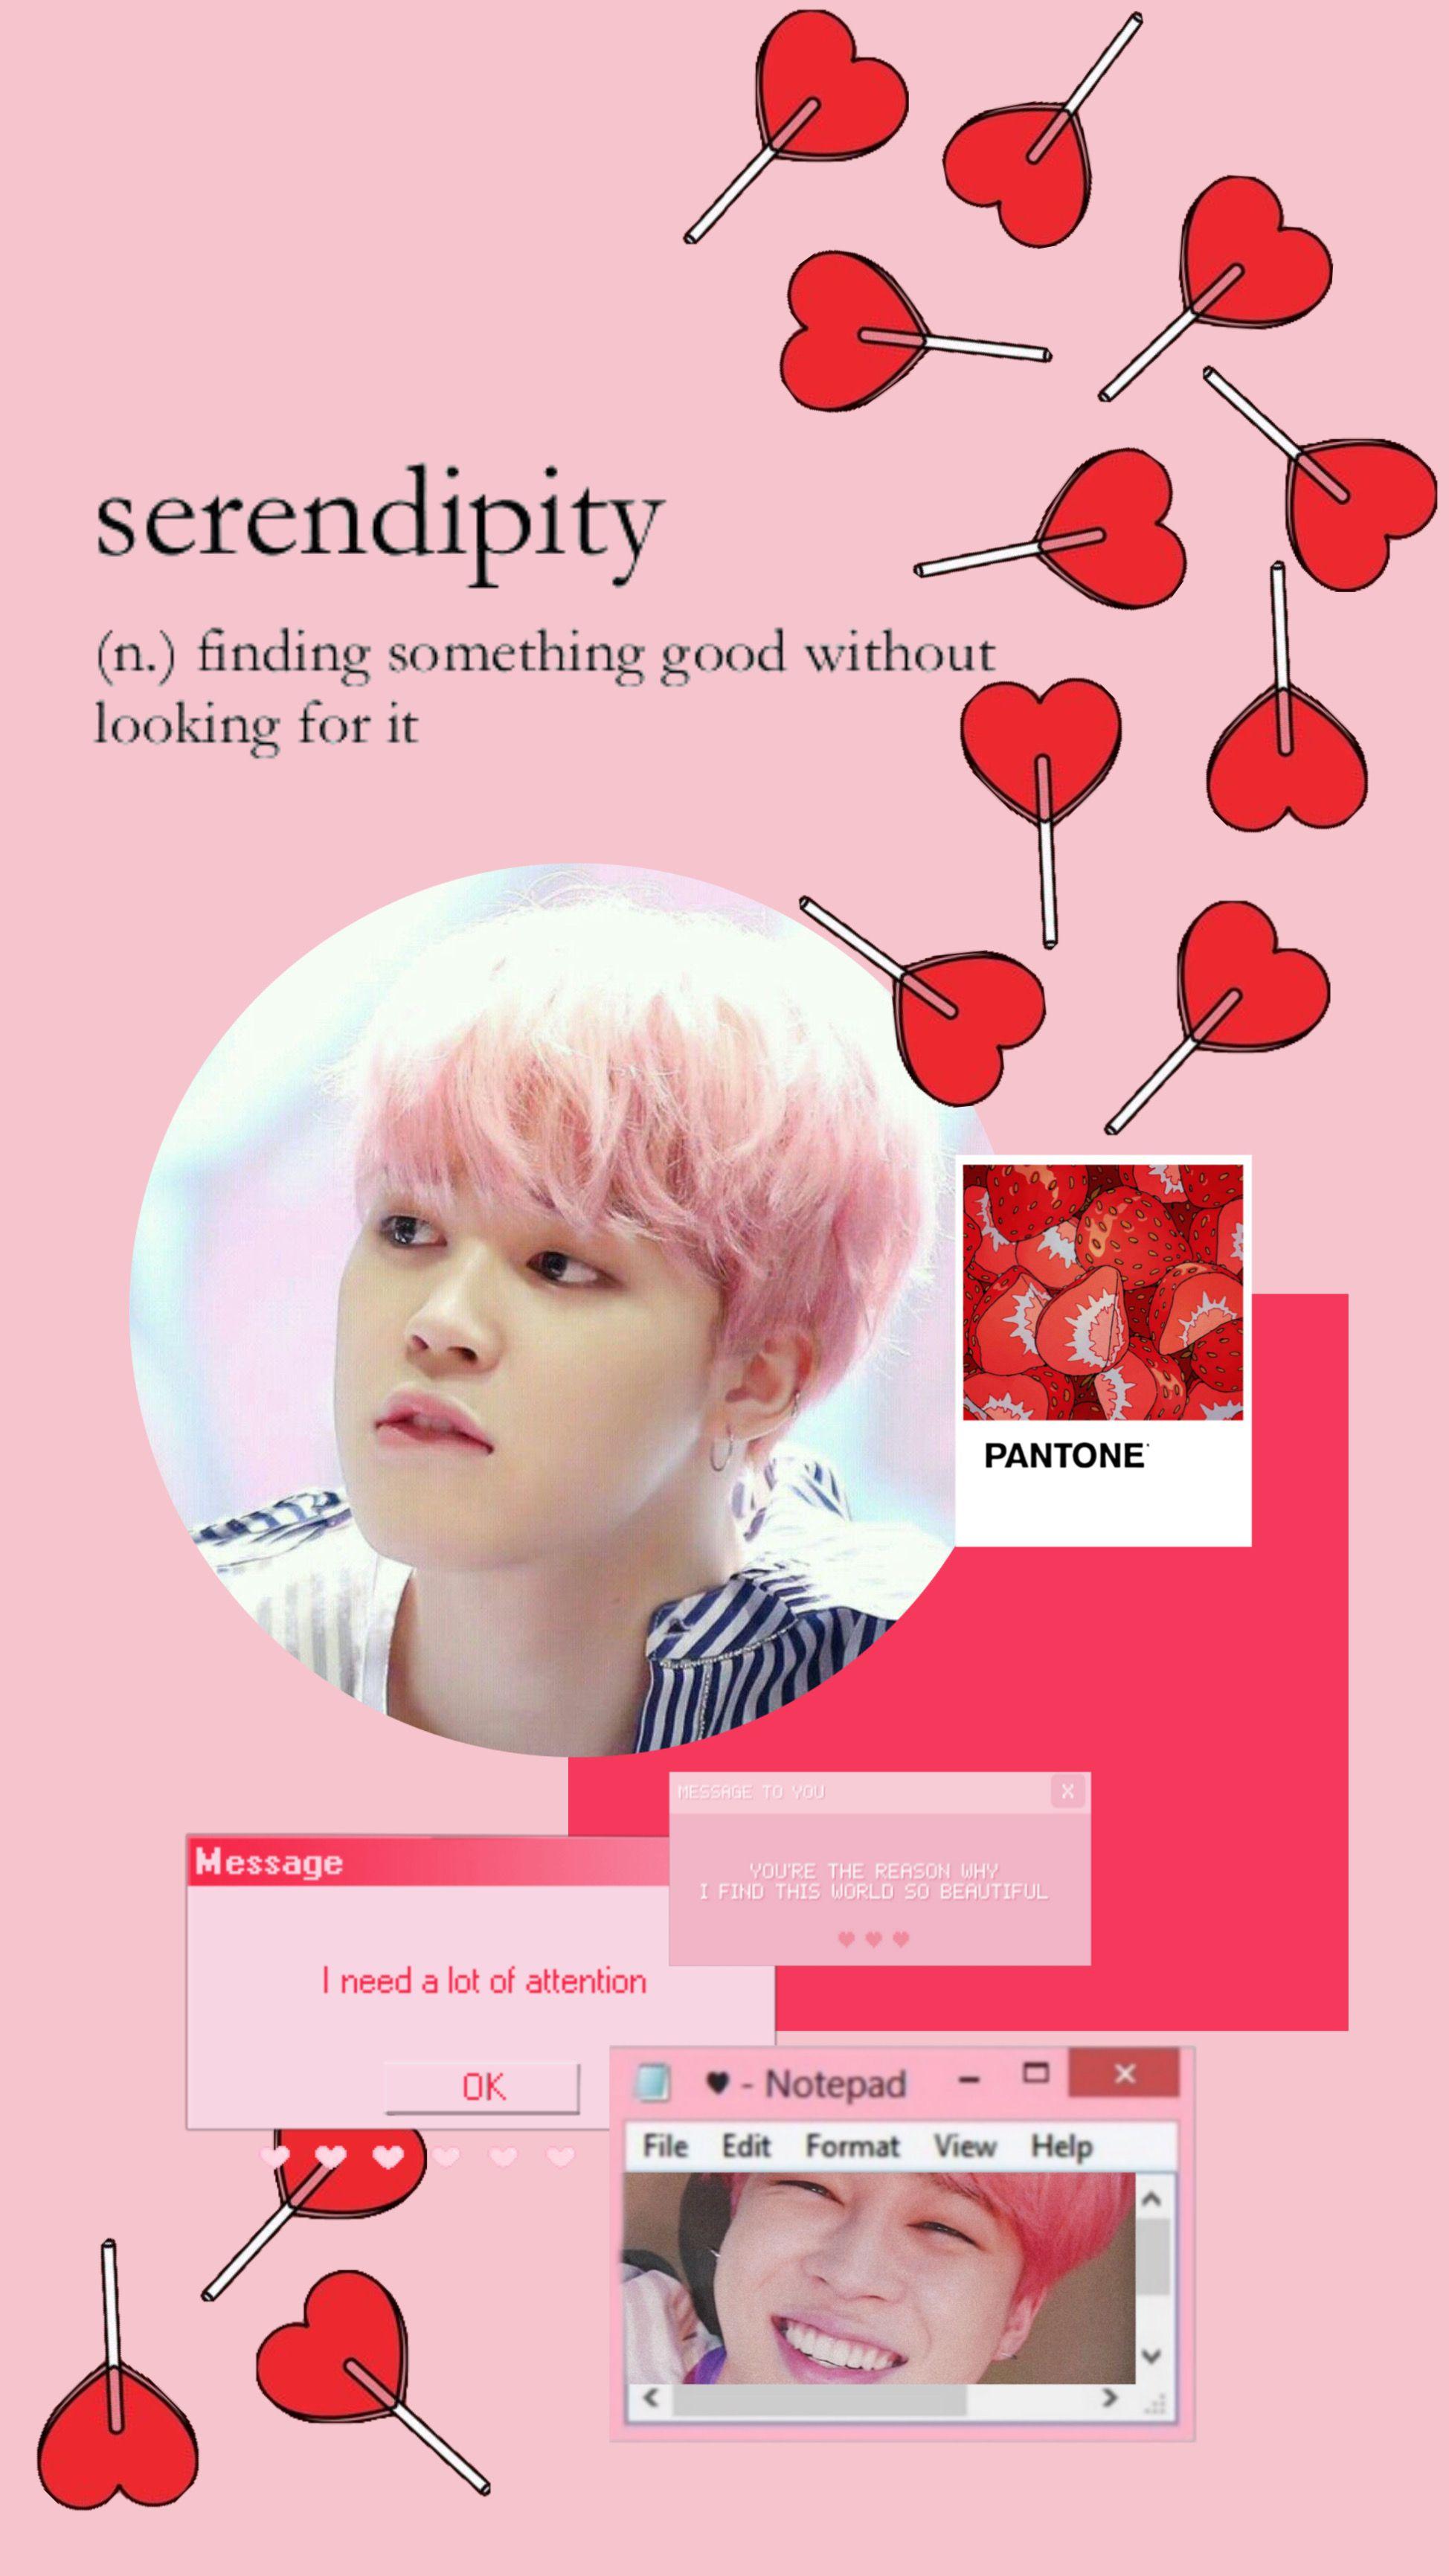 Jimin Pink Aesthetic Wallpaper Pink Aesthetic Aesthetic Wallpapers Jimin Wallpaper